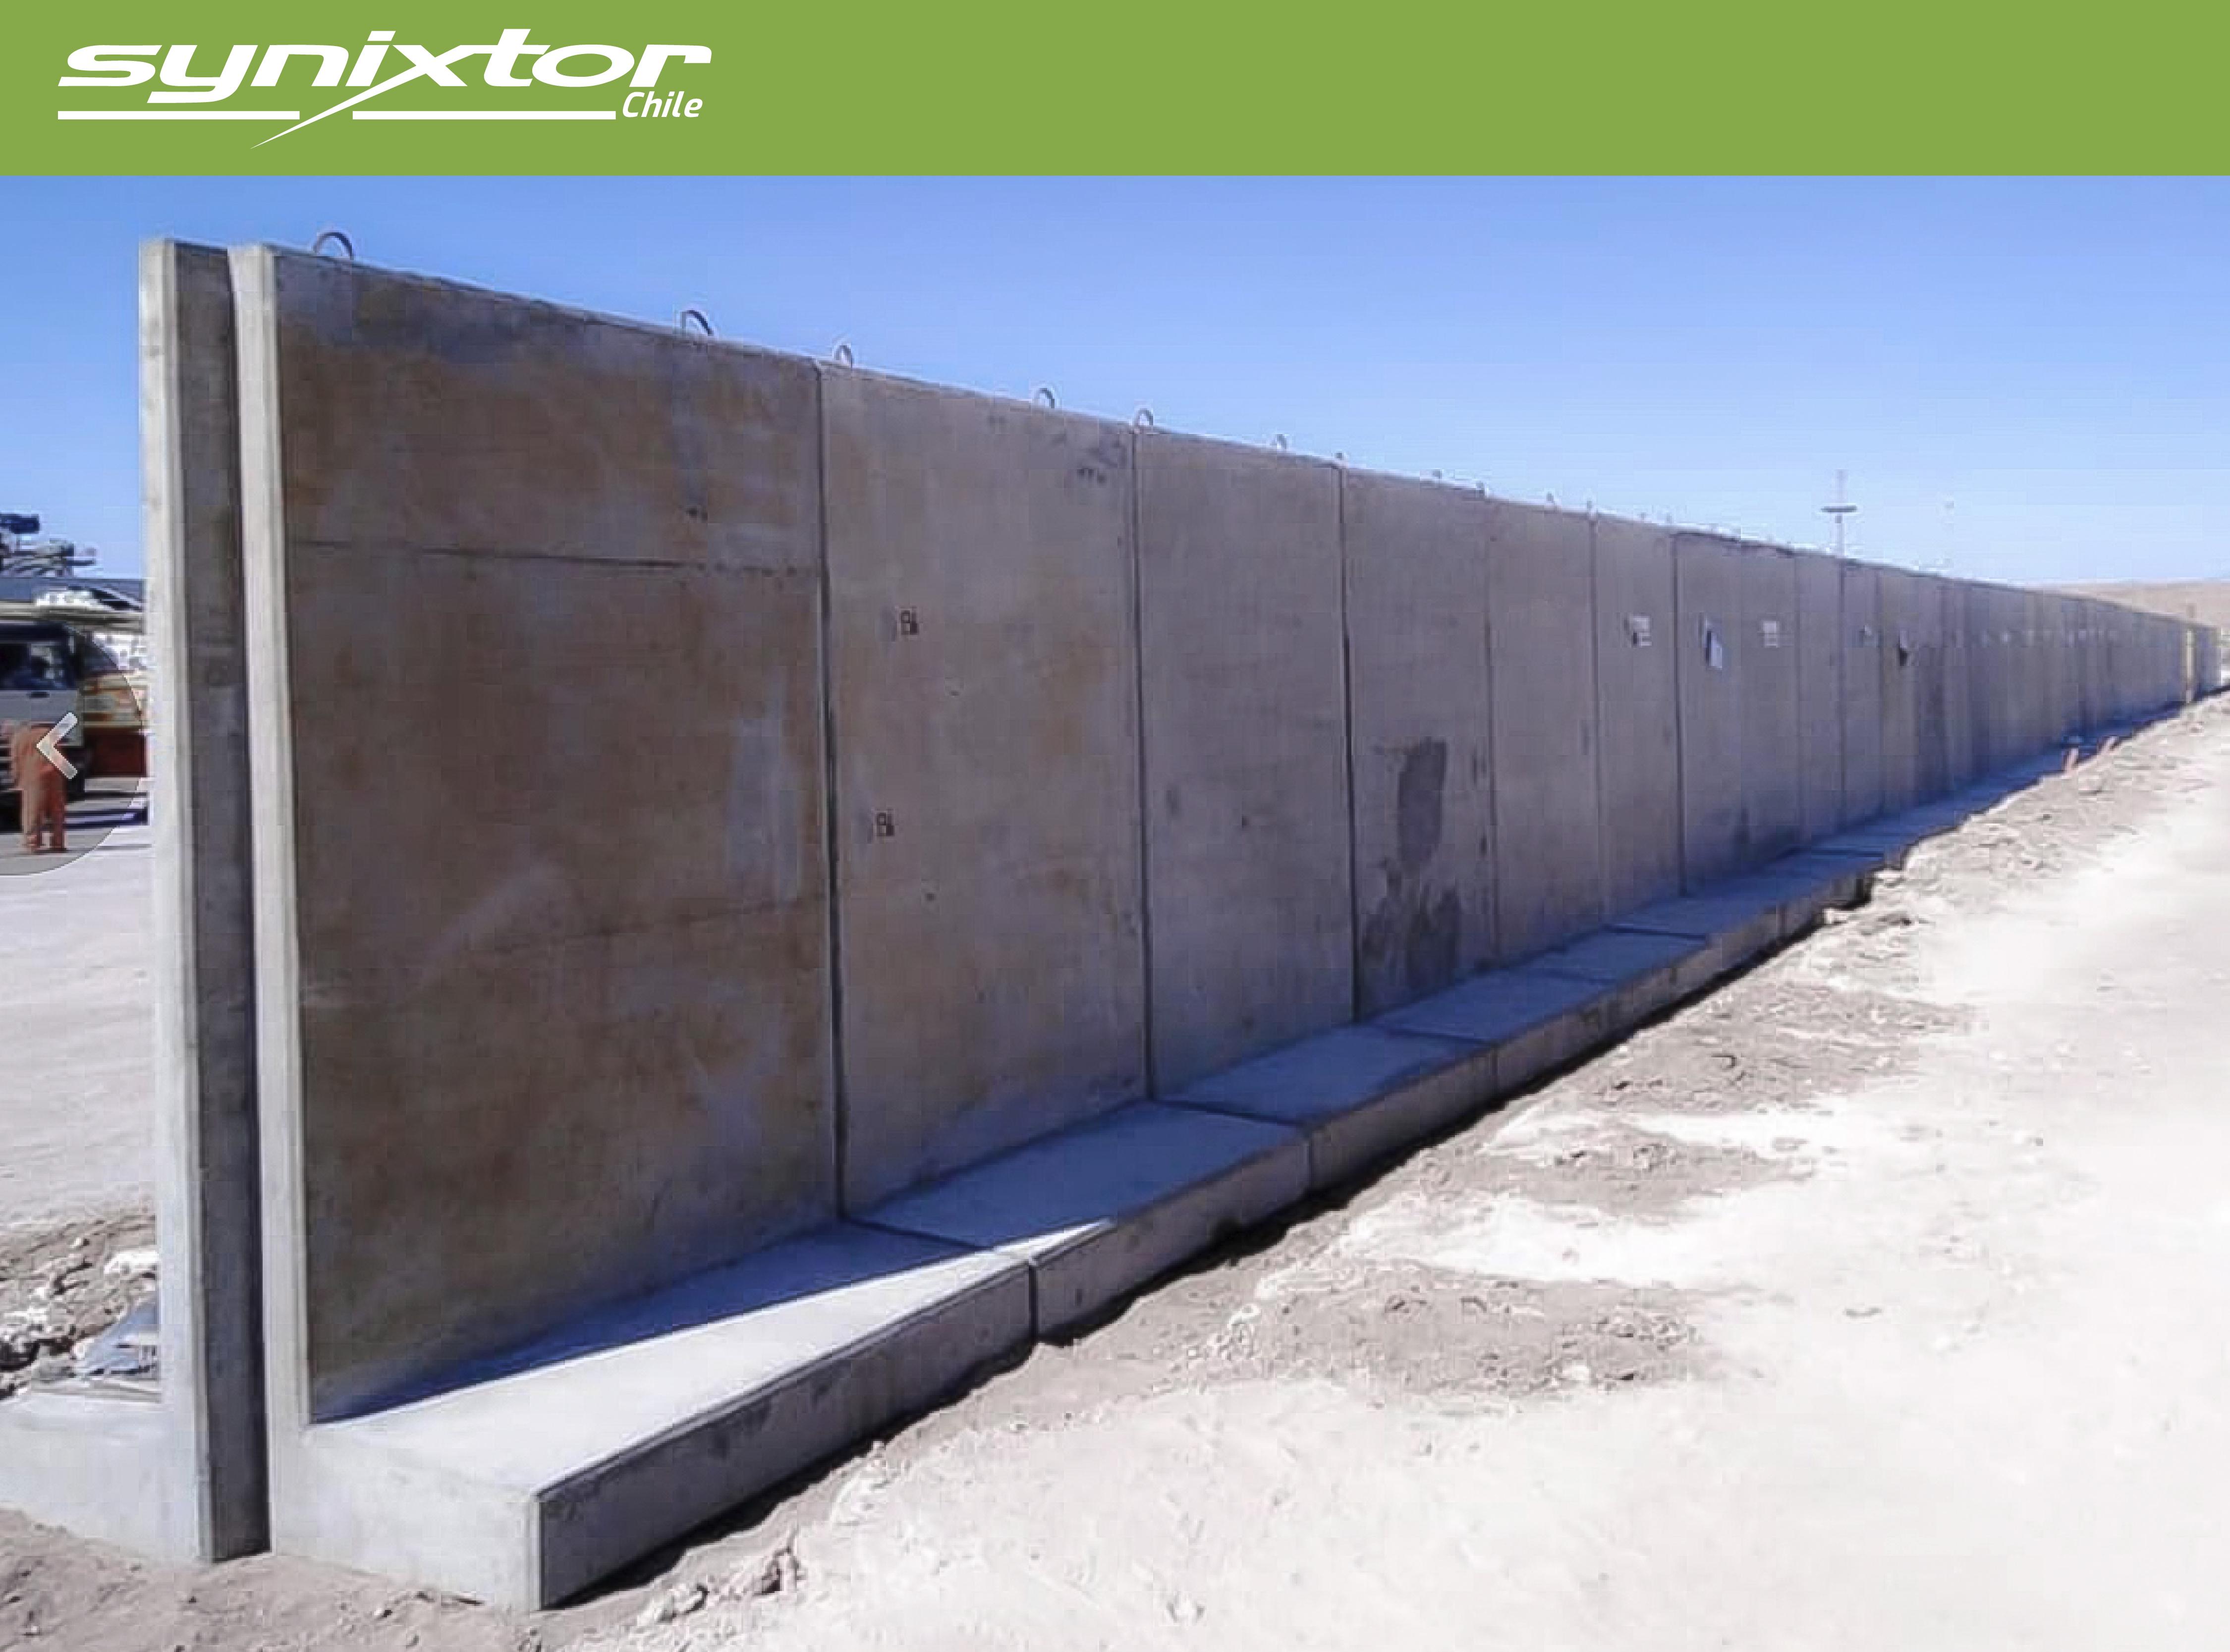 muro antivandalismo synixtor